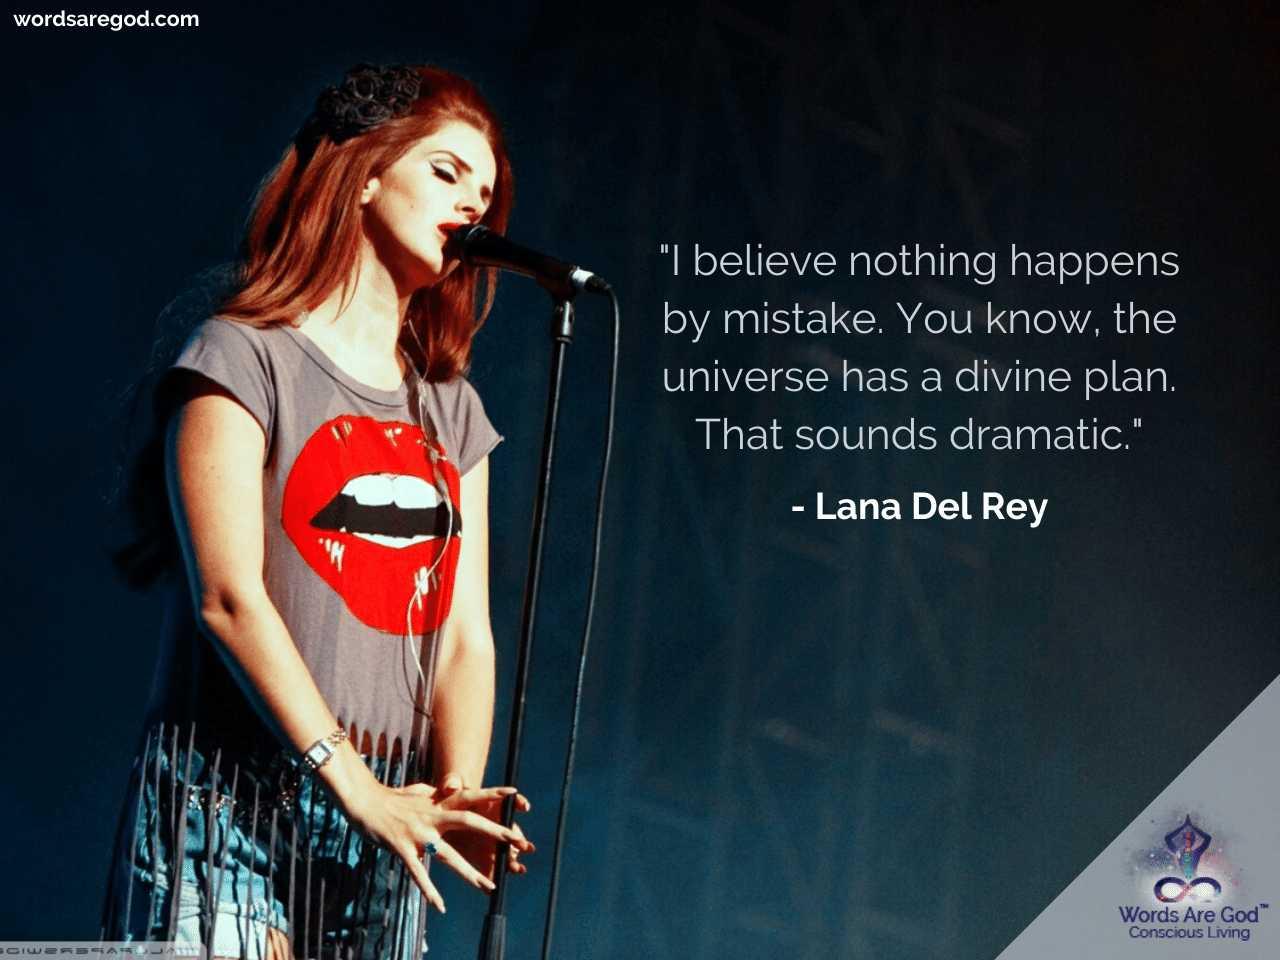 Lana Del Rey Life Quotes